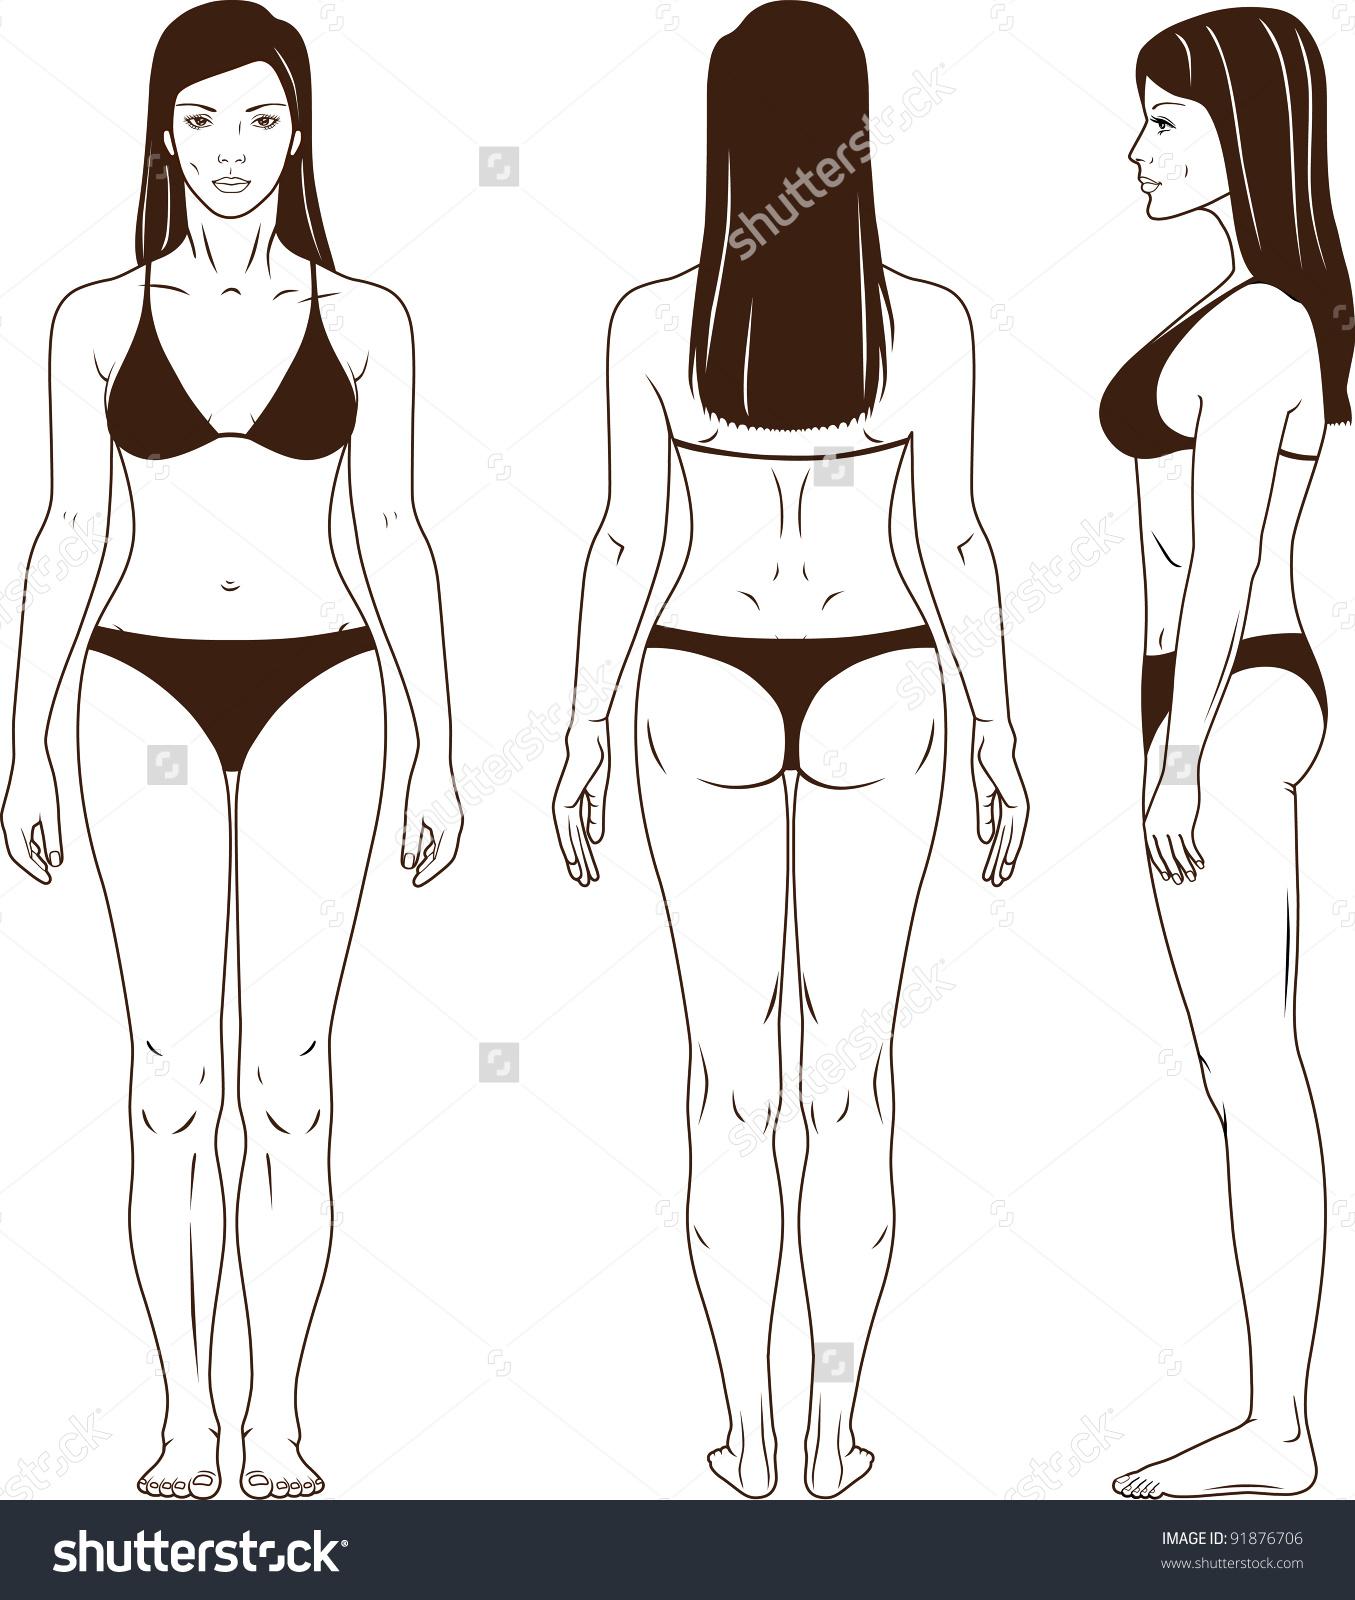 Woman back profile clipart.